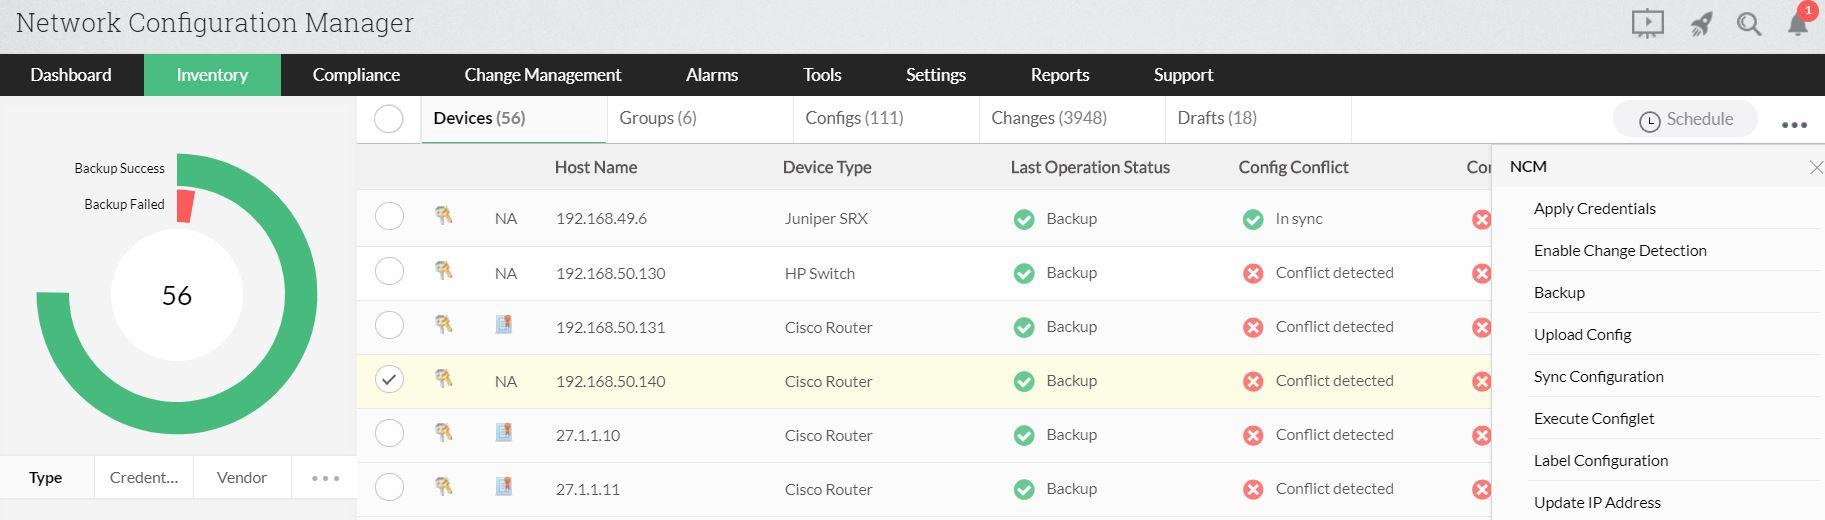 Manuel Ağ Konfigürasyon Yedeklemeleri - ManageEngine Network Configuration Manager